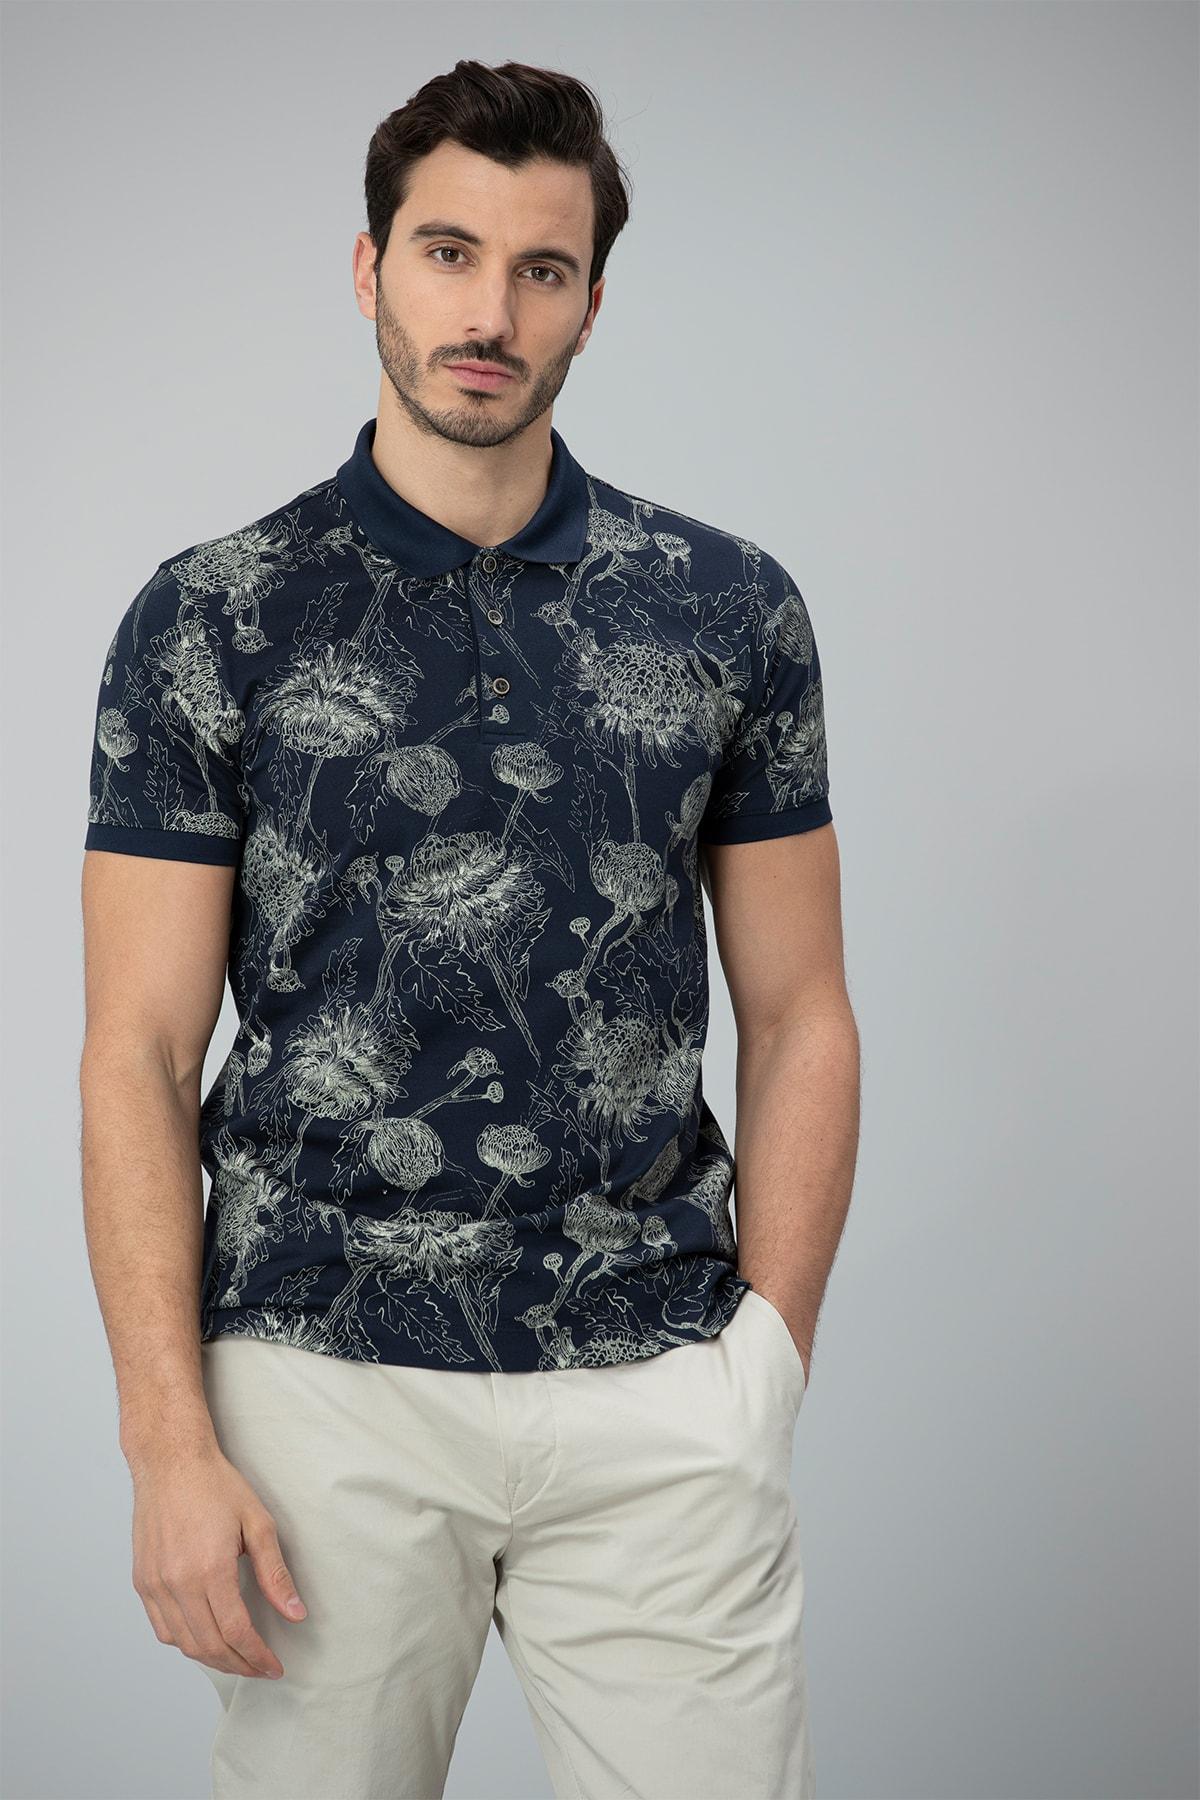 Lufian Capri Spor Polo T- Shirt Lacivert